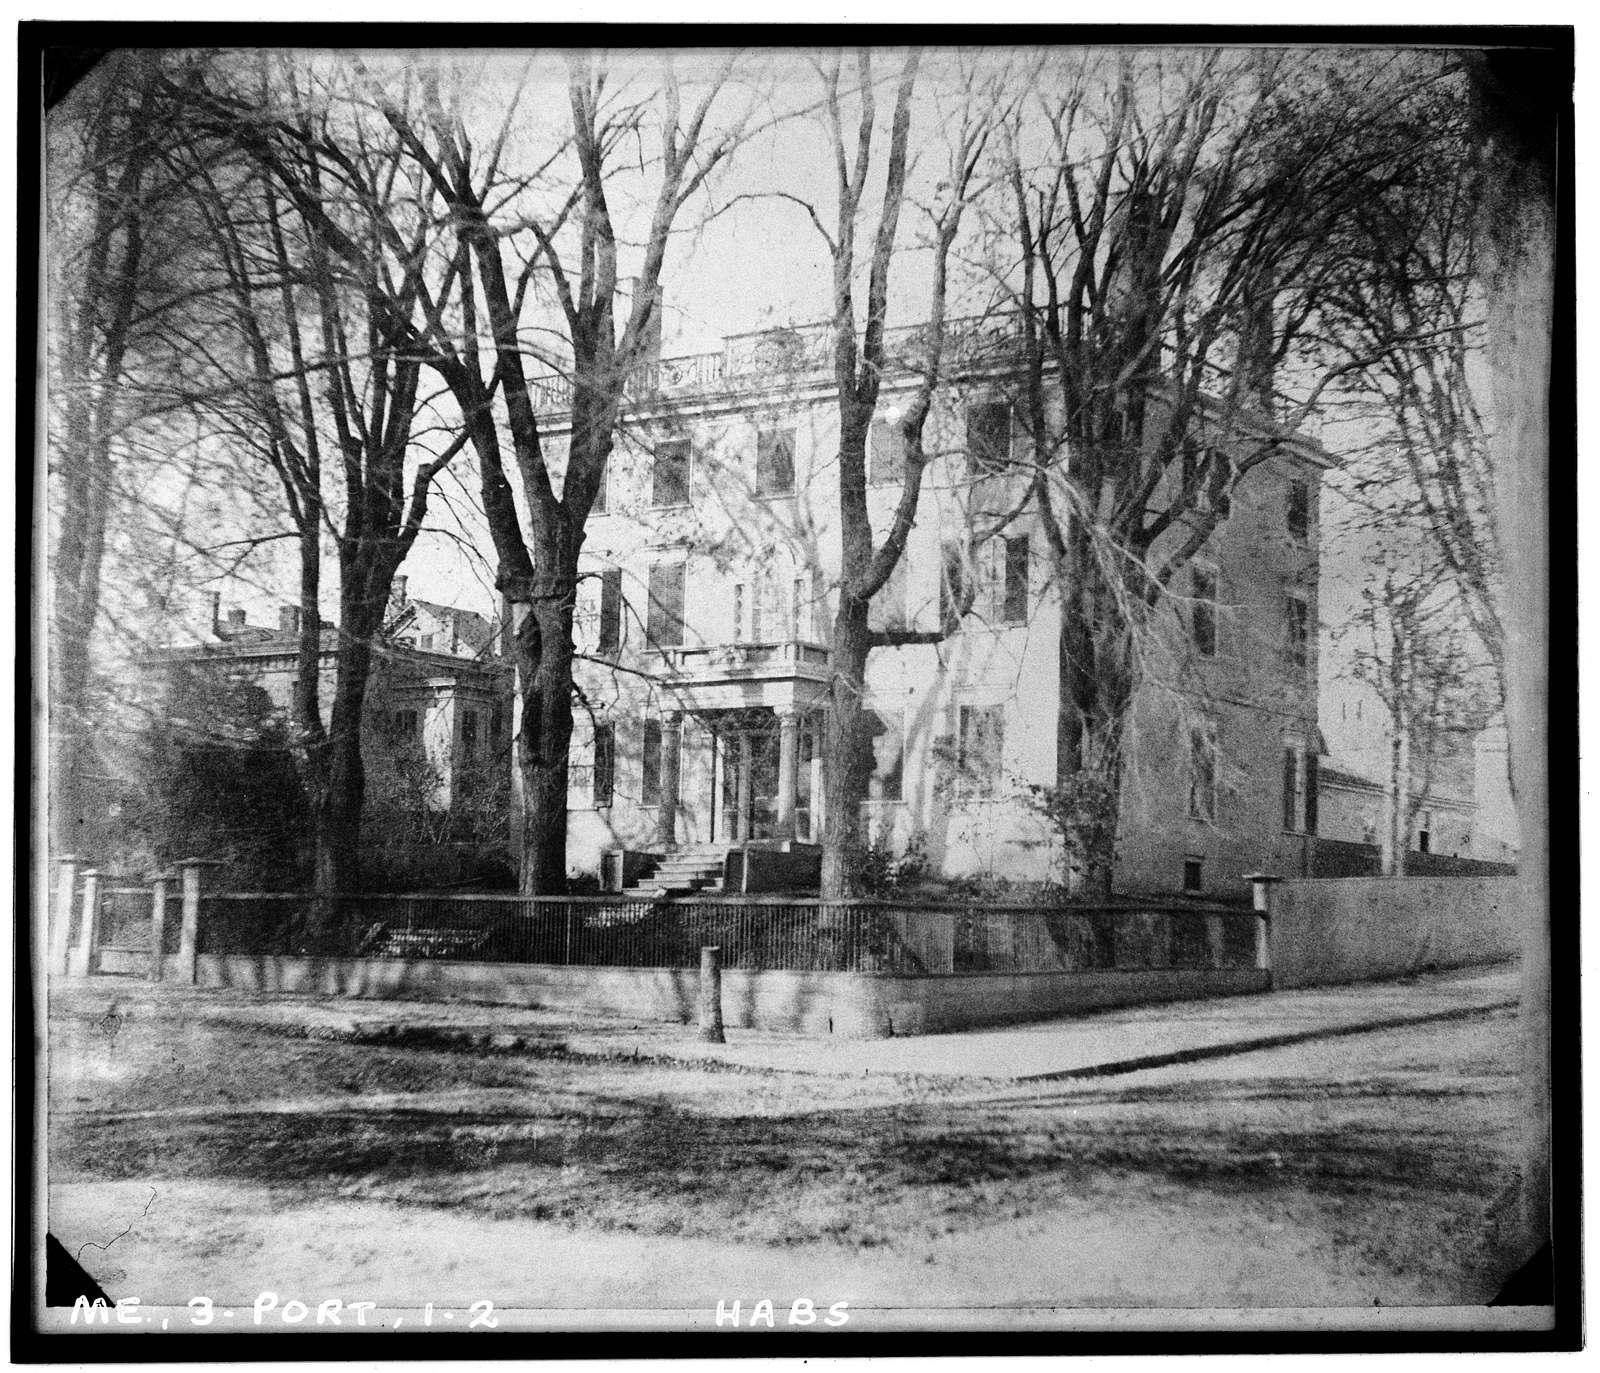 John Mussey House, 91 Danforth Street Northwest, Portland, Cumberland County, ME